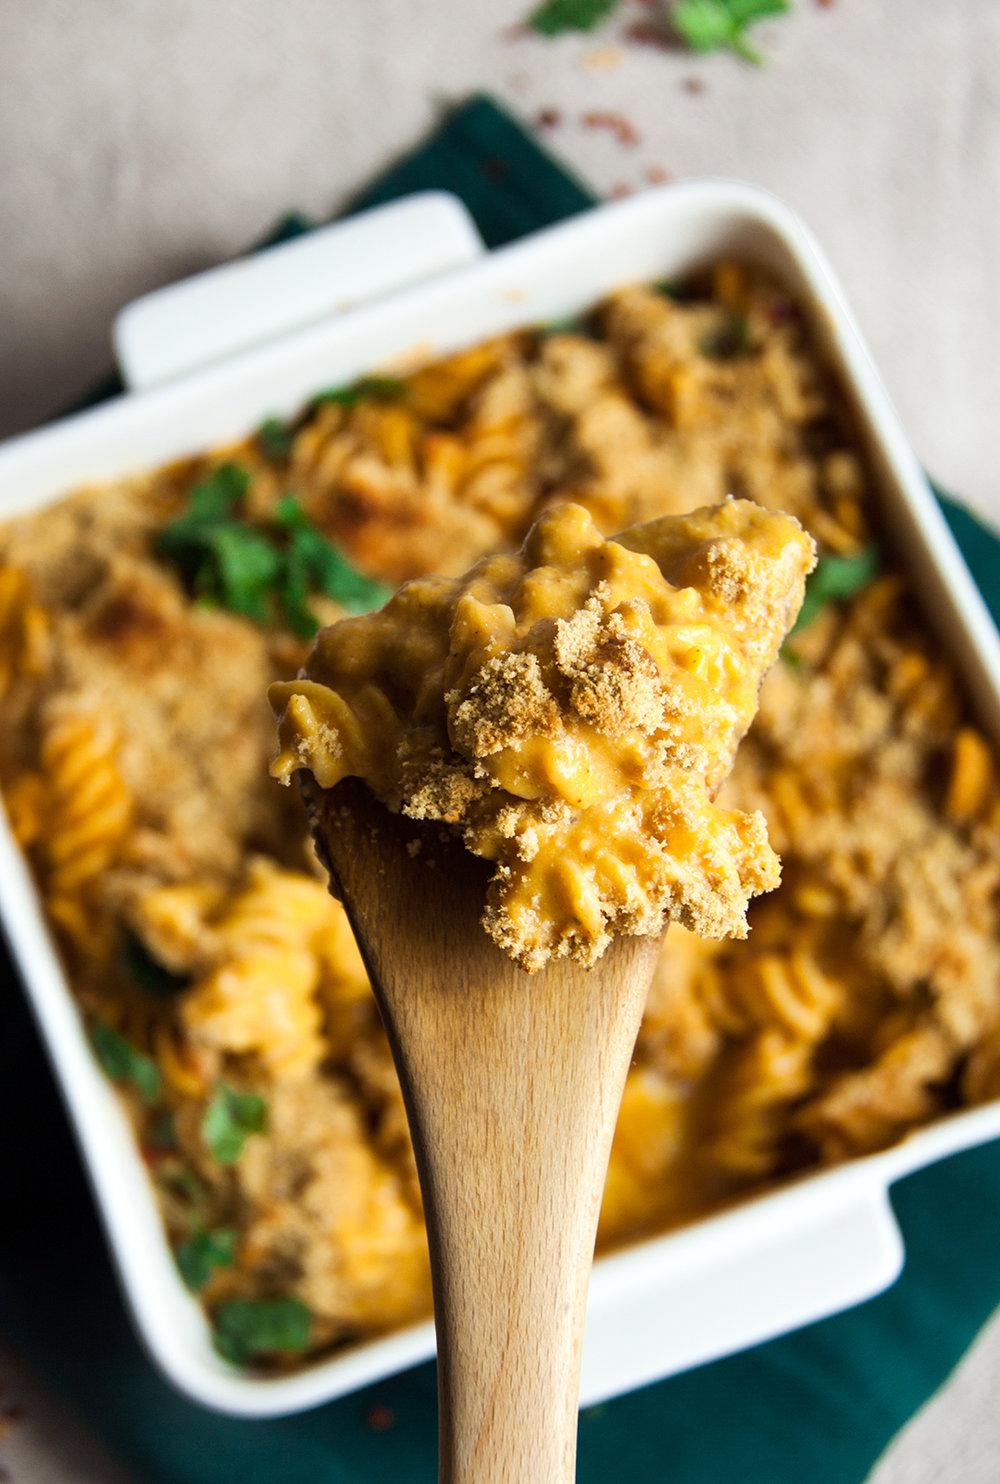 mac-cheese-jalapeno-vegan-whole-foods-olievrij-glutenvrij-01.jpg